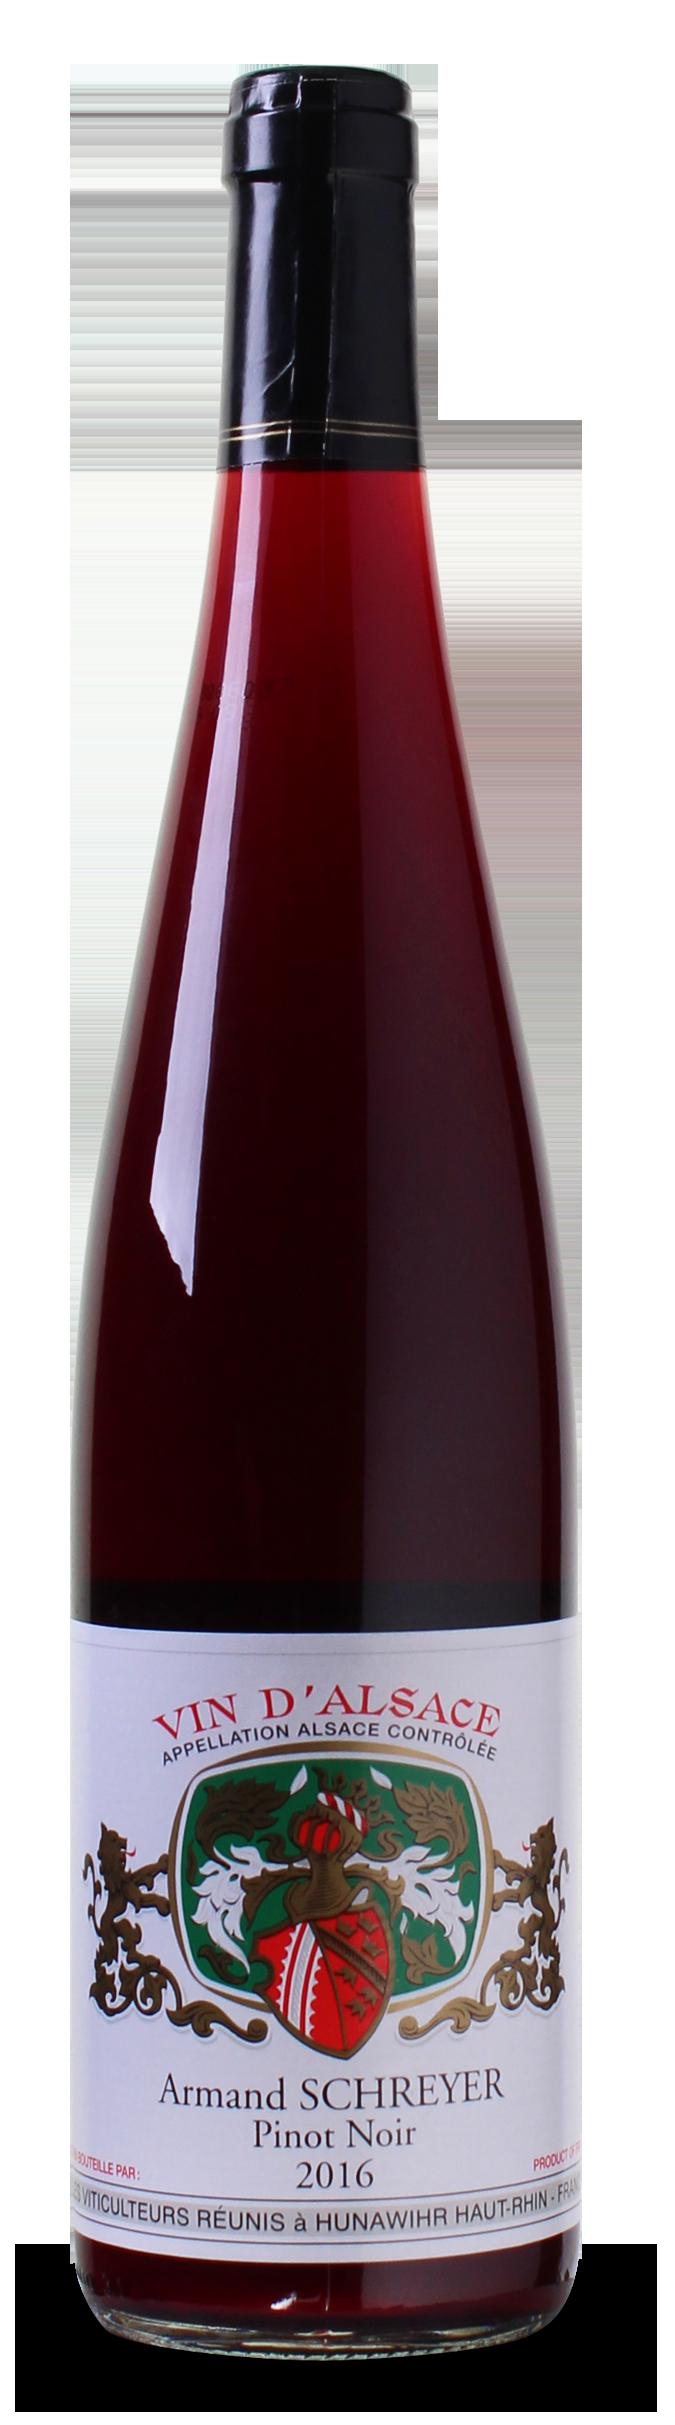 Afbeelding van Armand Schreyer Pinot Noir Alsace AOC